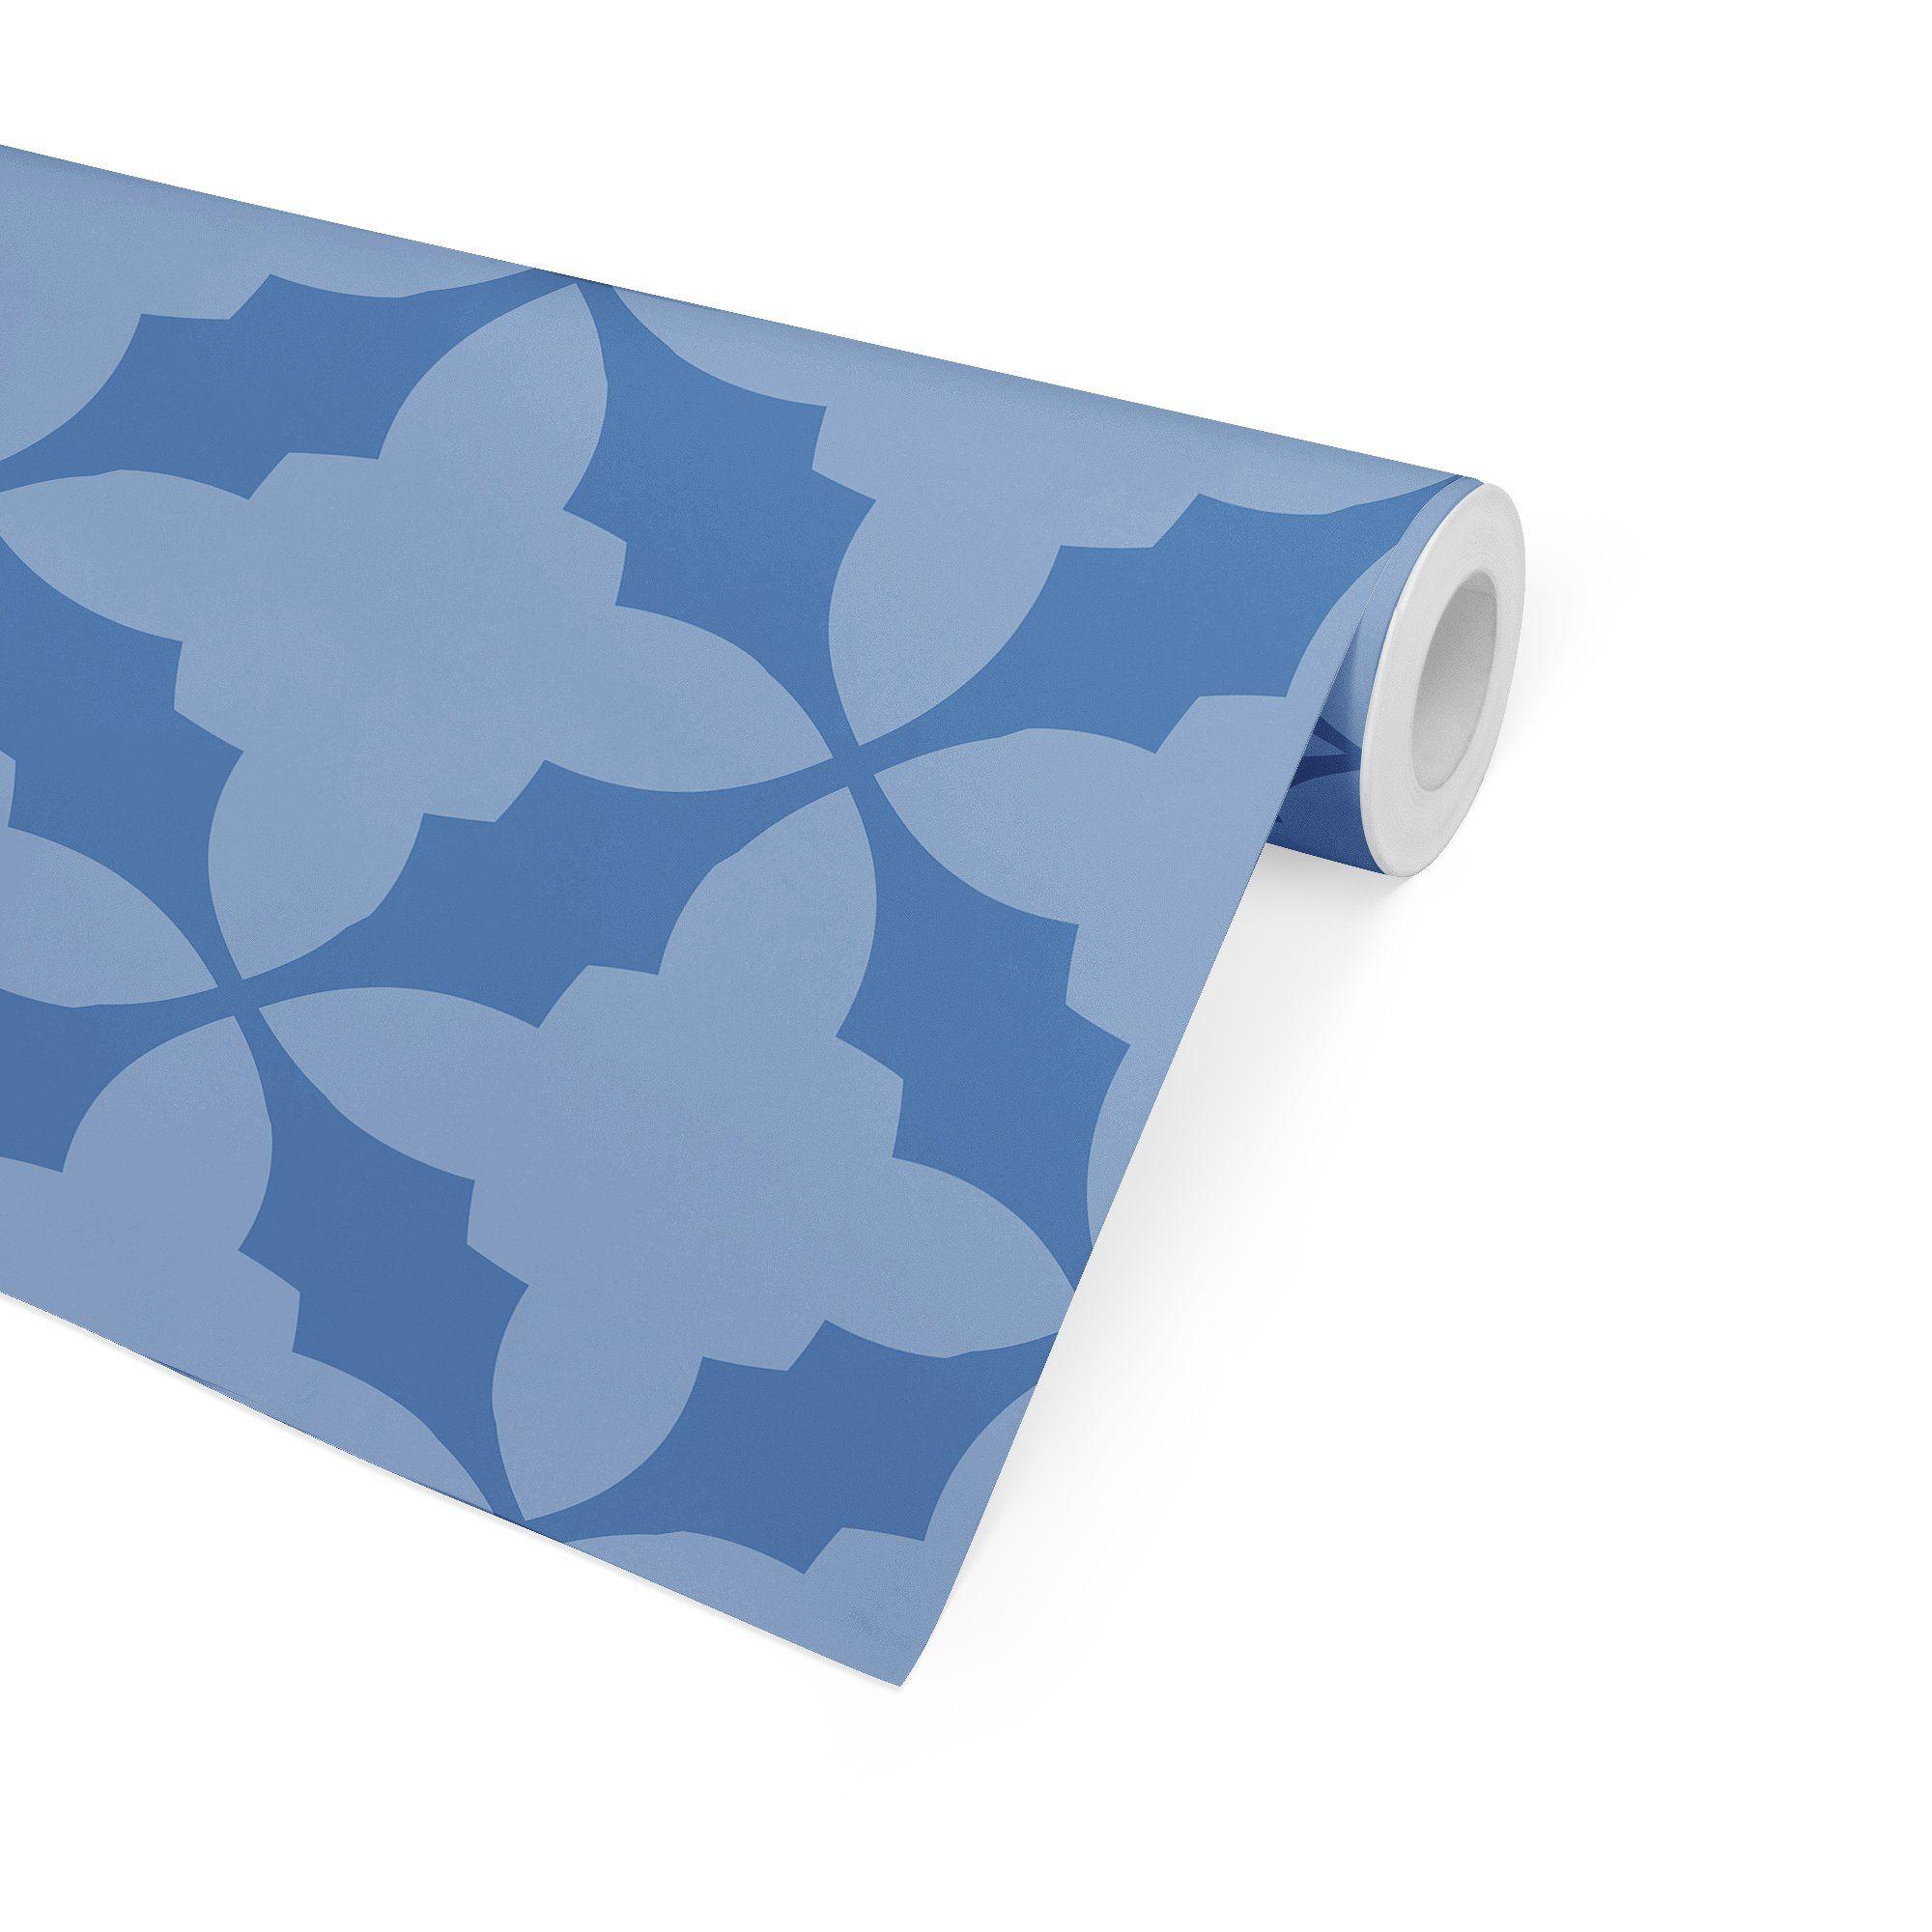 STARR BLUE Peel and Stick Wallpaper By Terri Ellis - 2ft x 16ft